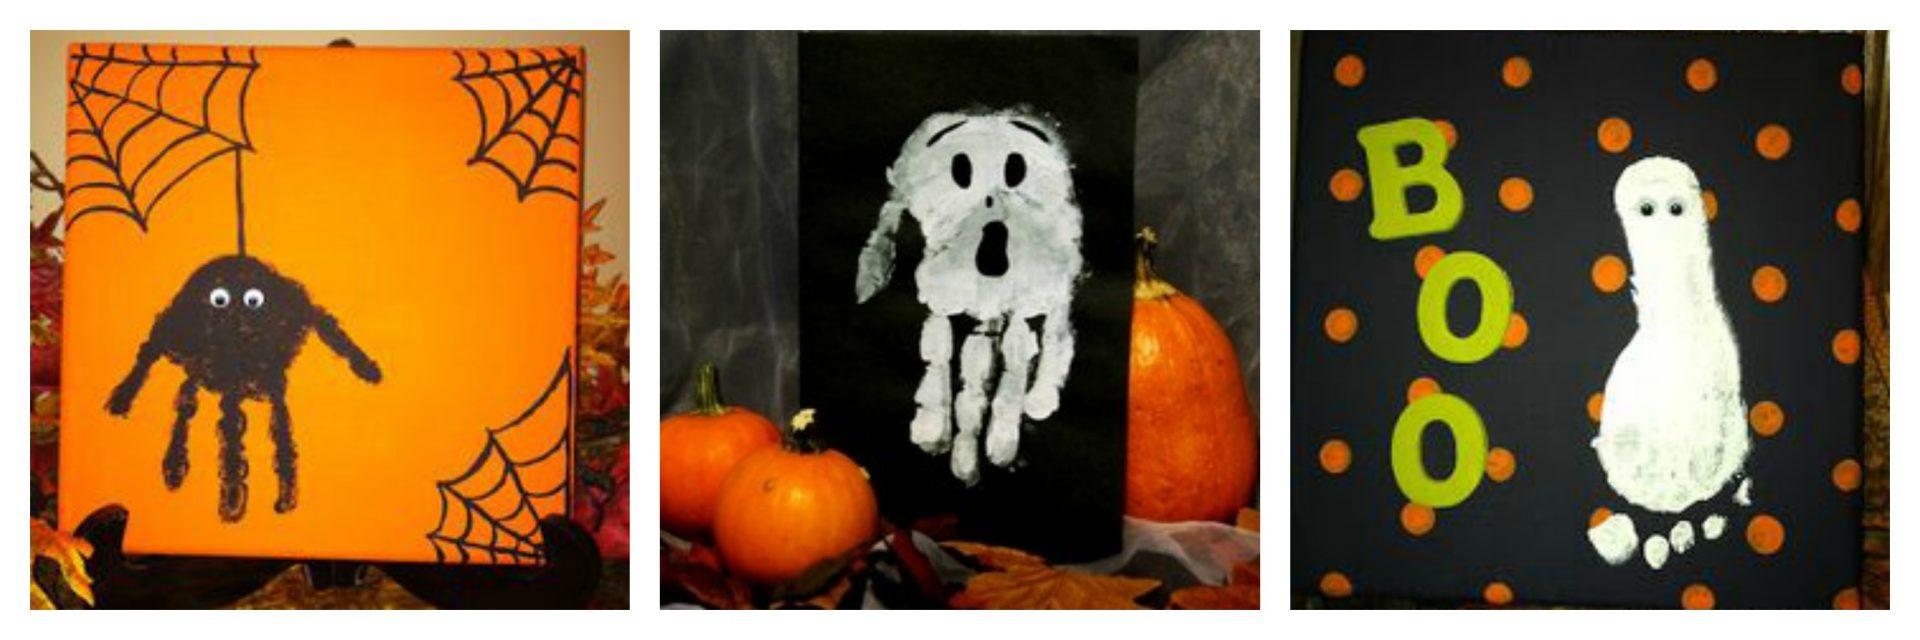 halloween - Halloween tricks and treats